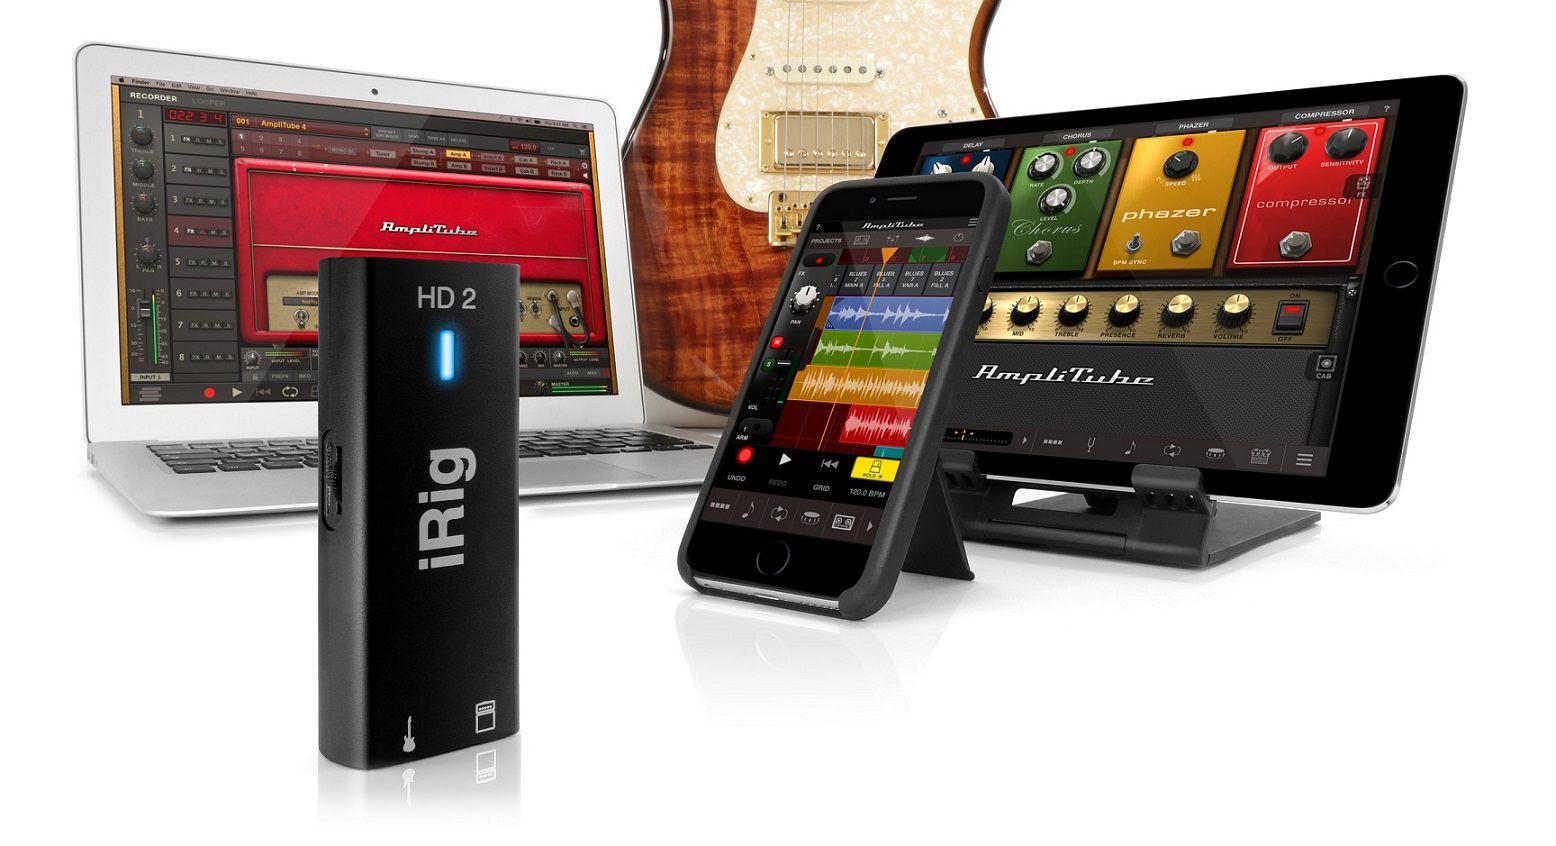 Interface IK Multimedia iRig HD 2 - iOS